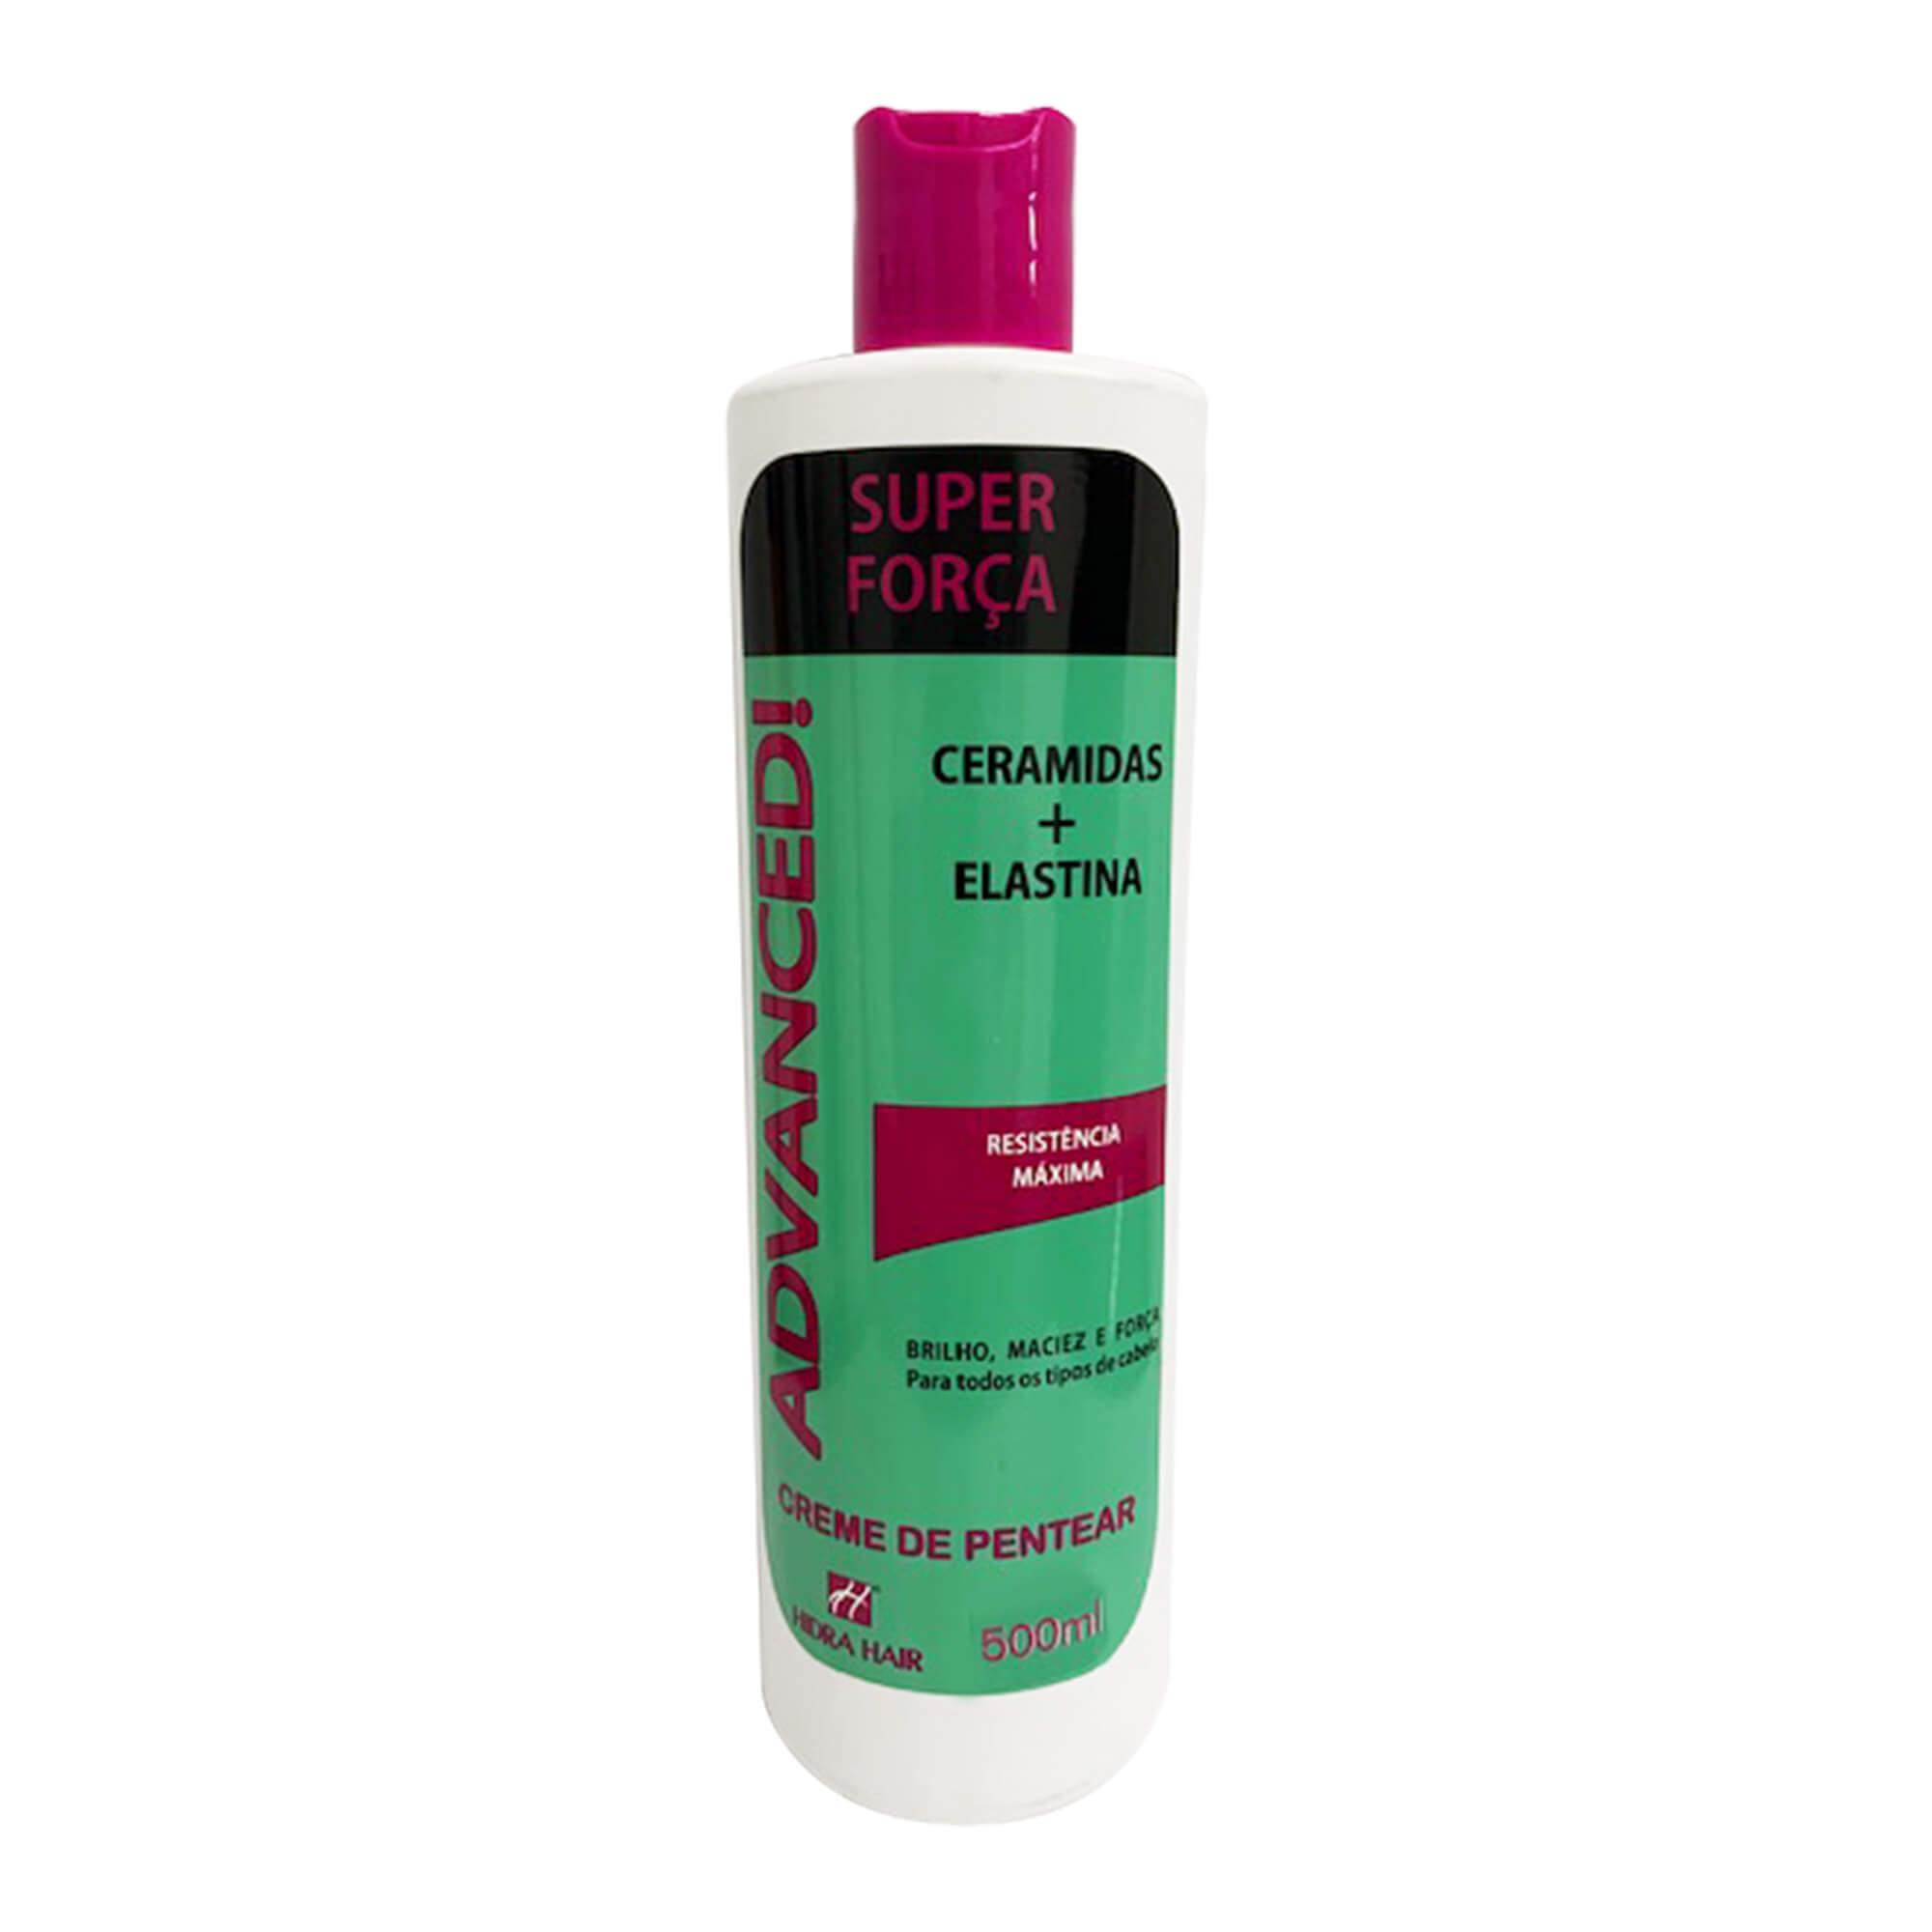 Creme de pentear Advanced Resistência  Máxima 500 ml